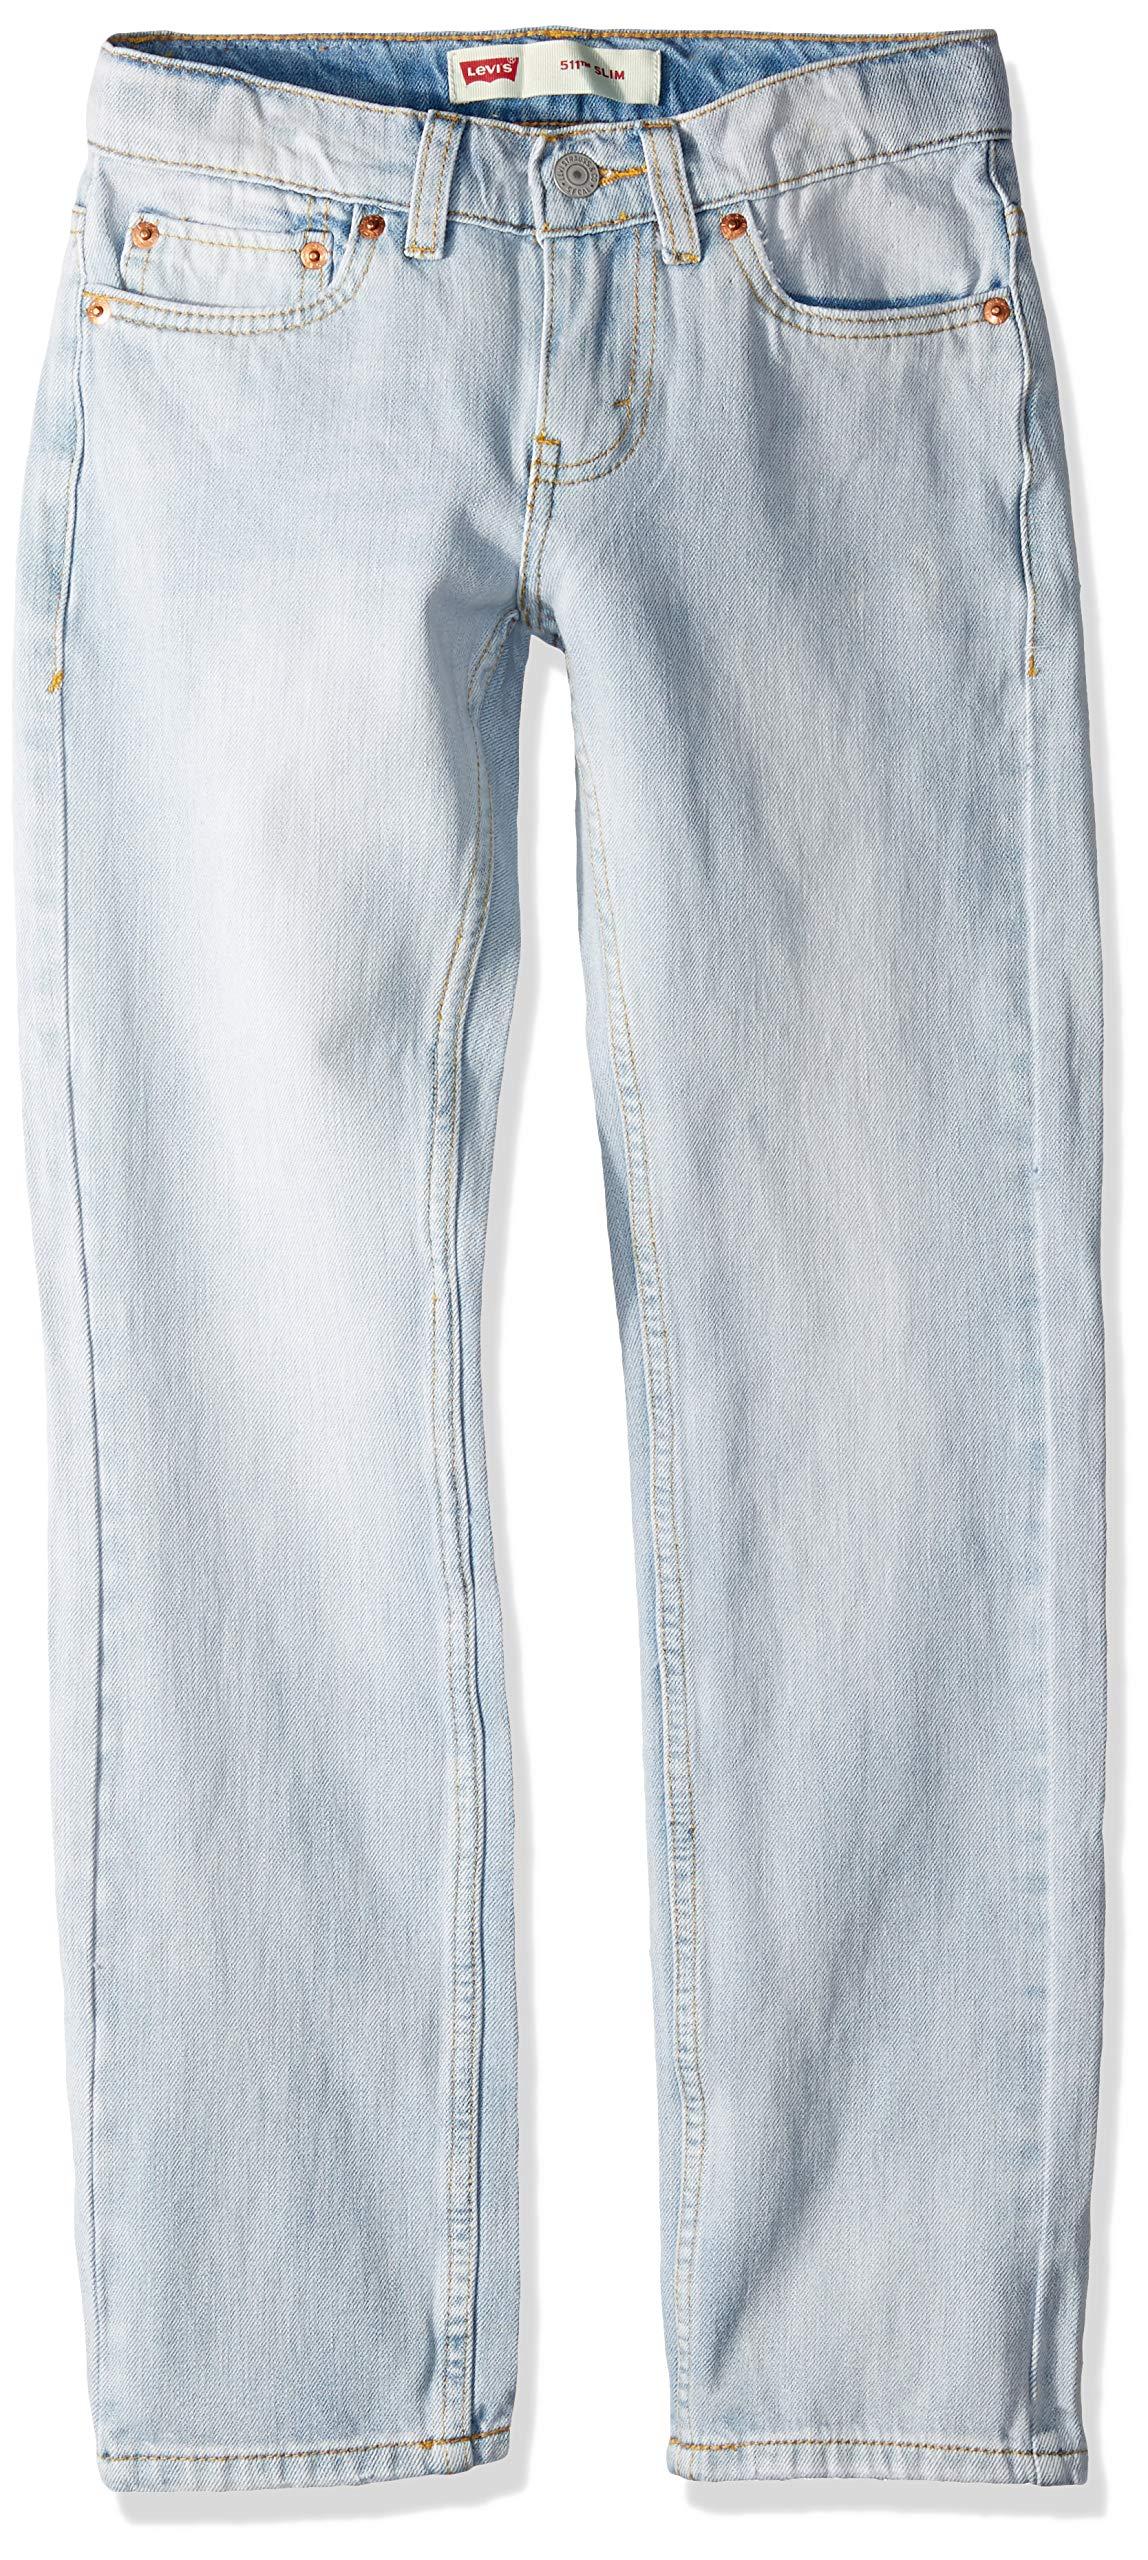 Levi's Boys' Big 511 Slim Fit Performance Jeans, Abbot Kinney, 12